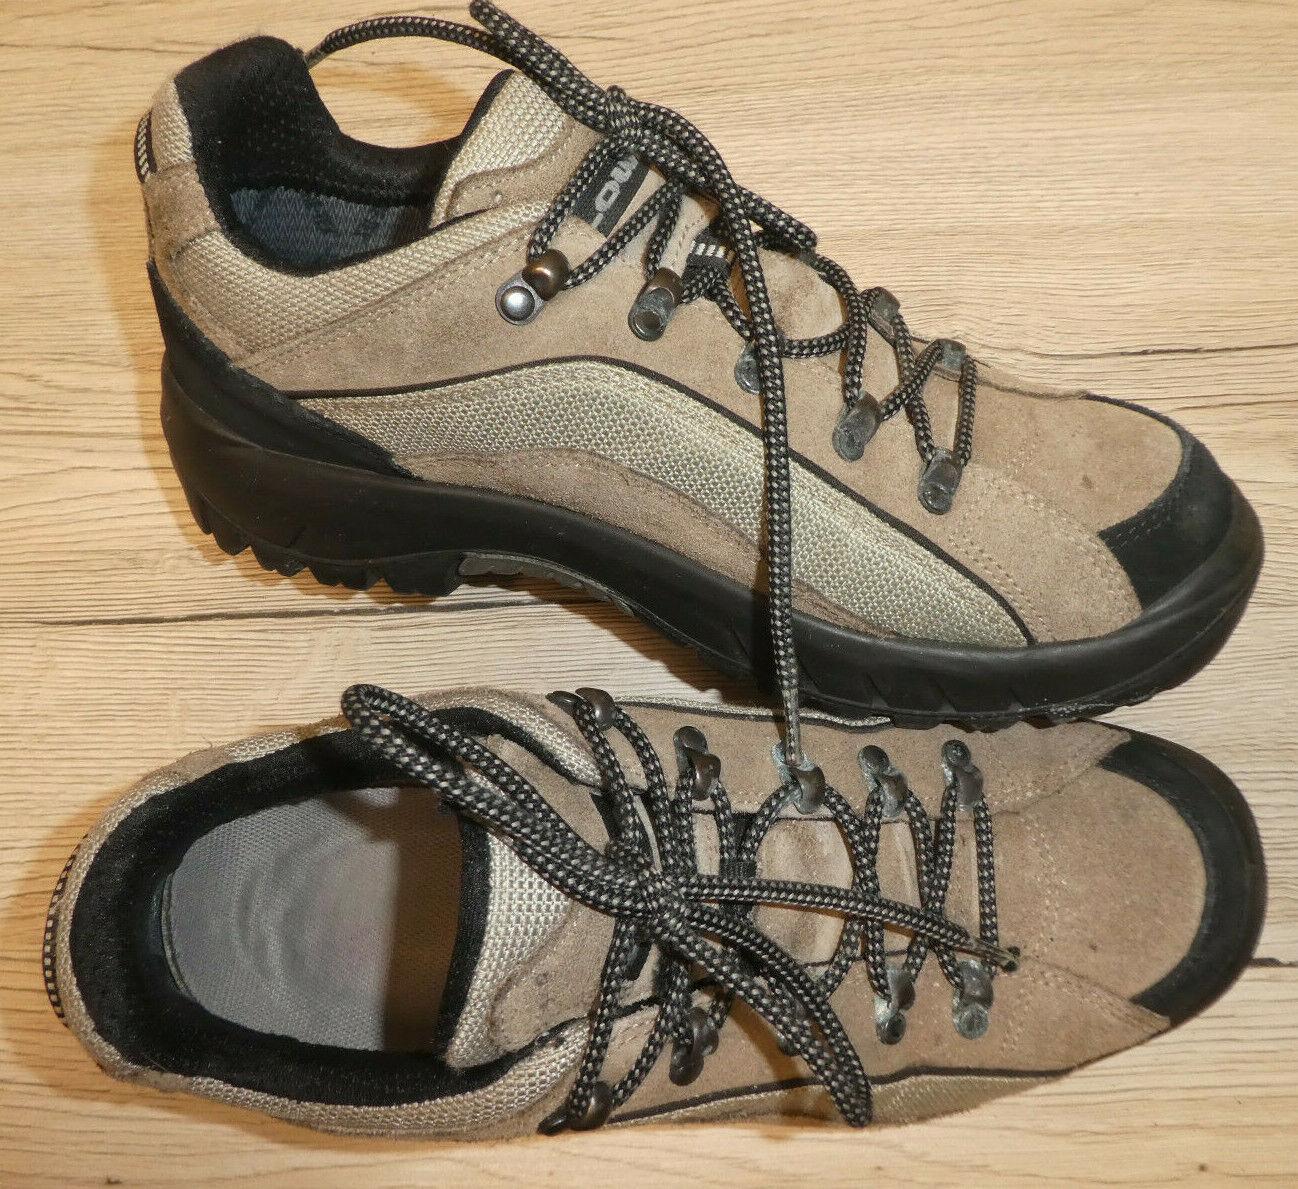 Lowa    Scarponcini donna scarpe da trekking mis. 39 40  MarroneeE NABUK Goretex